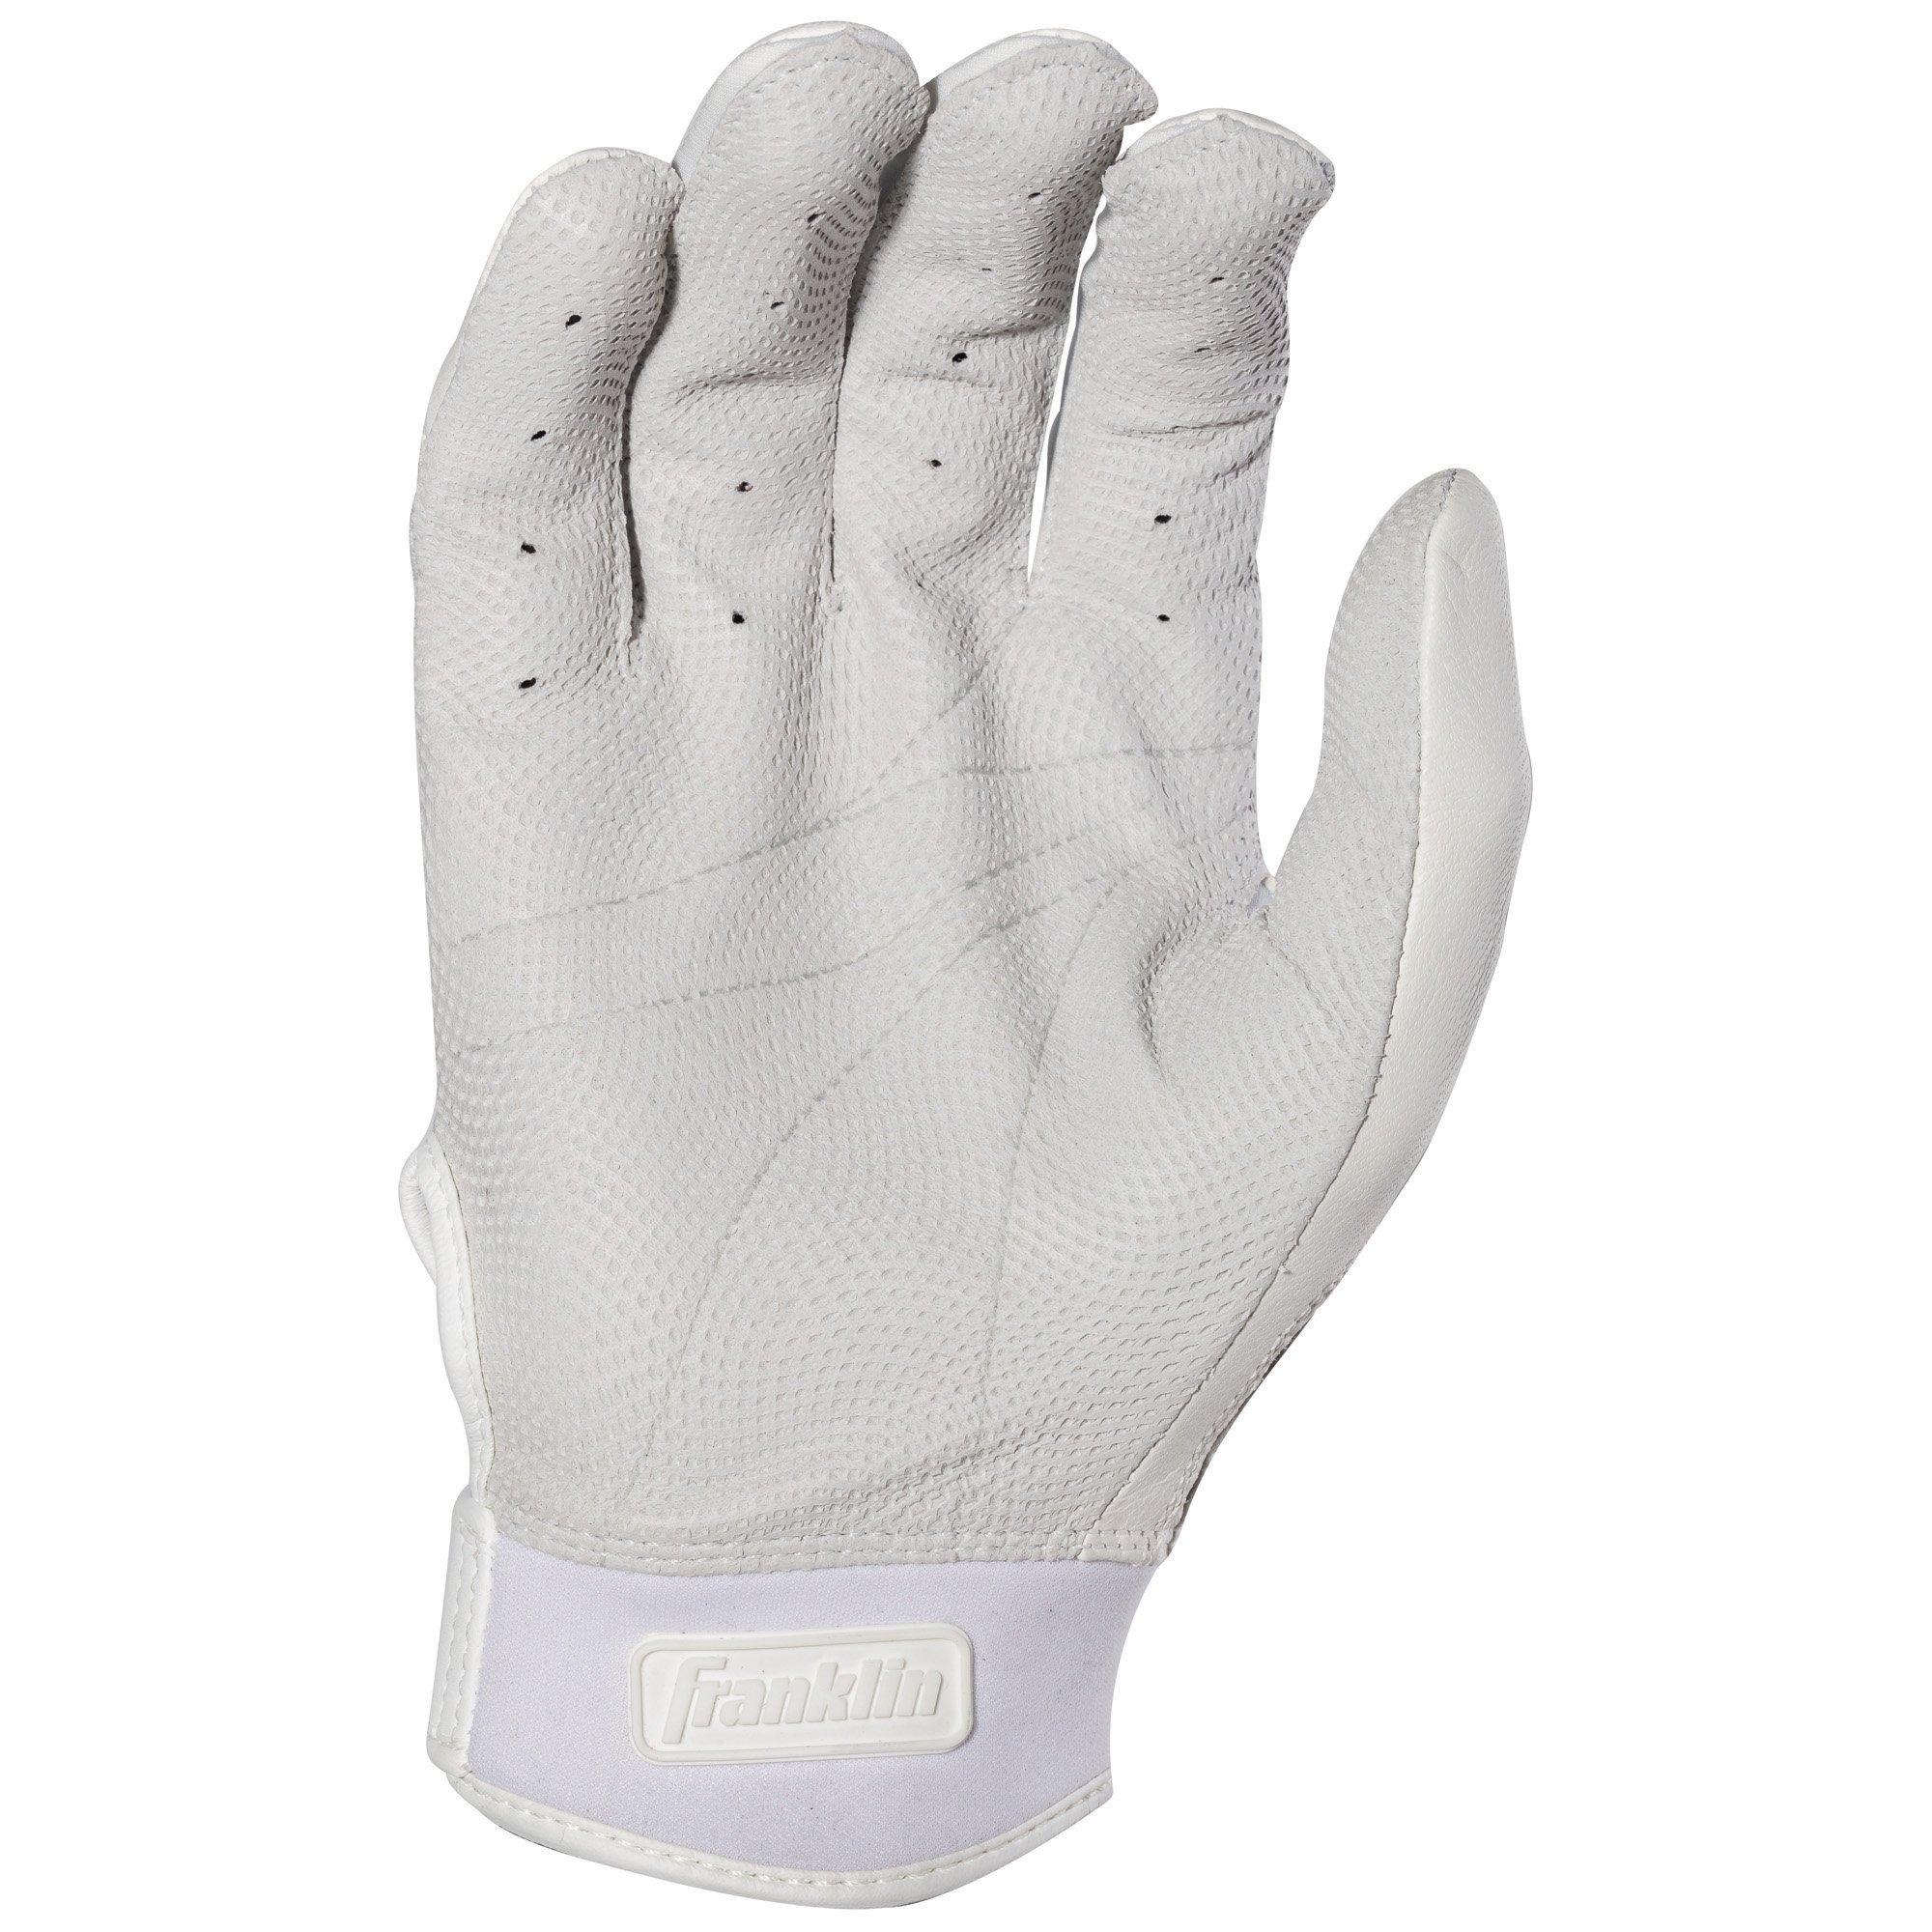 Franklin Sports CFX Pro Full Color Chrome Series Batting Gloves CFX Pro Full Color Chrome Batting Gloves, White, Adult Small by Franklin Sports (Image #3)